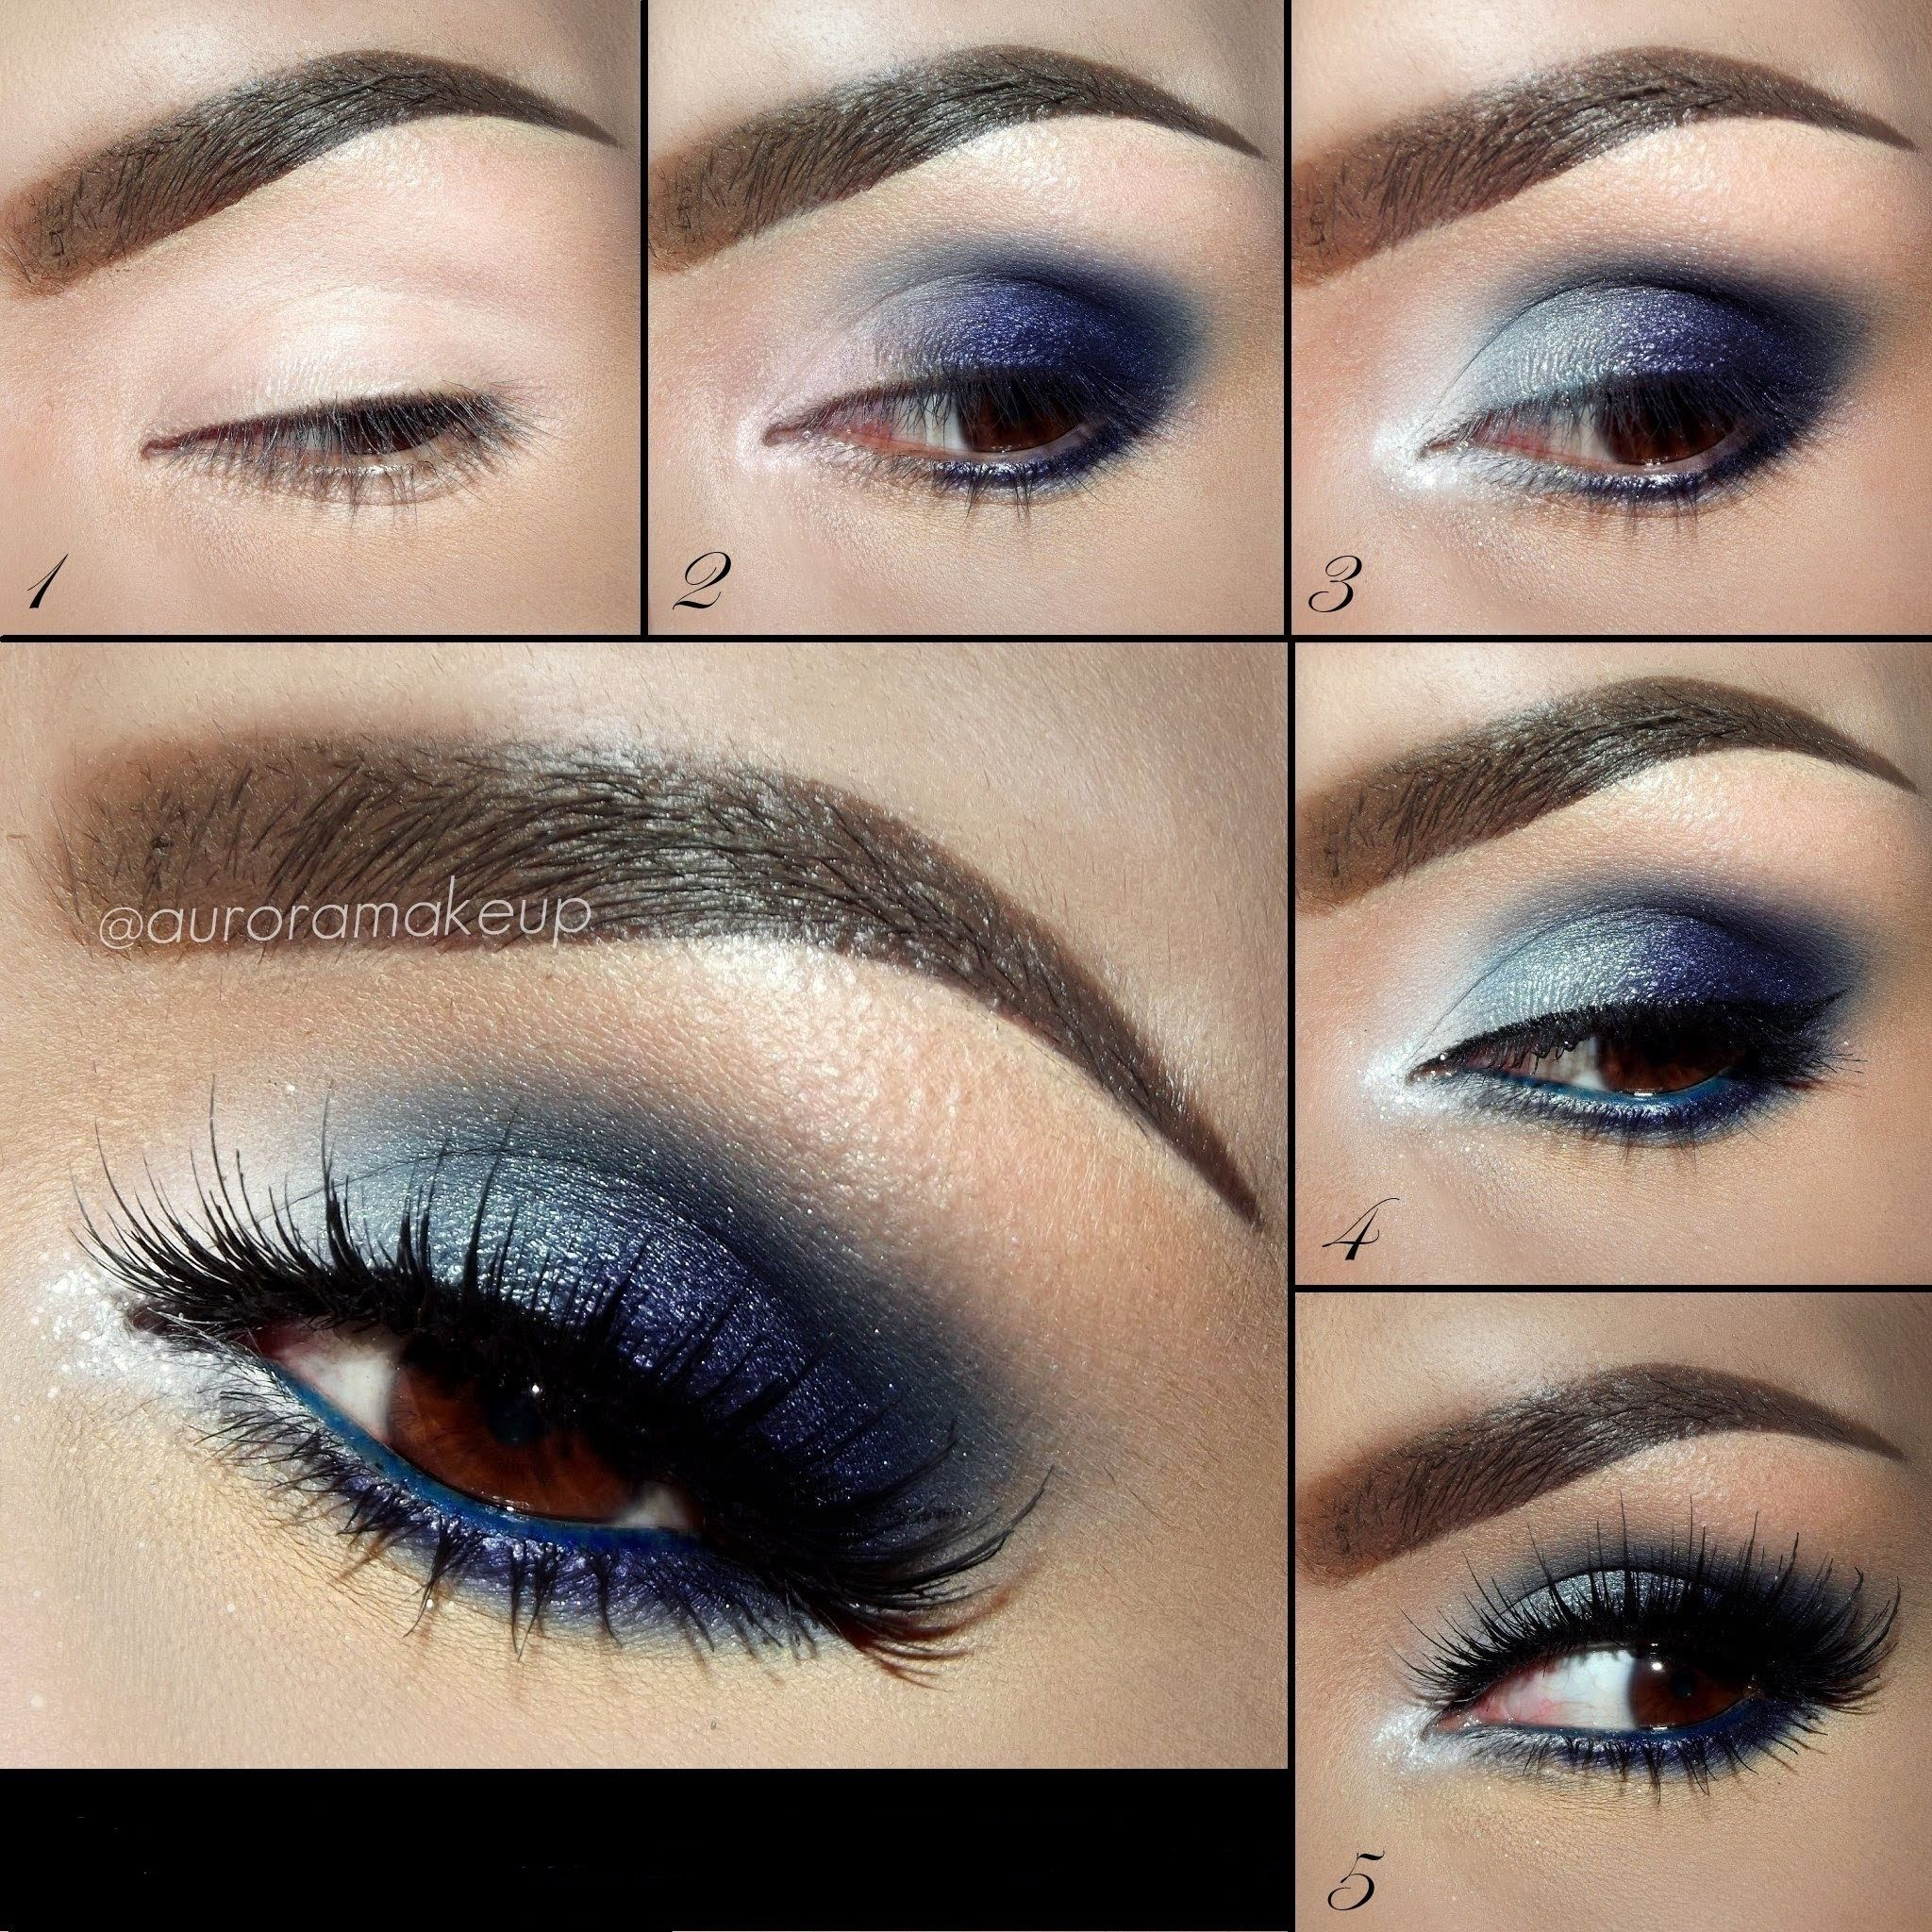 Blue smokey eye makeup for brown eyes decorativestyle eyeshadow for brown eyes blue smokey eye makeup tutorials baditri Image collections